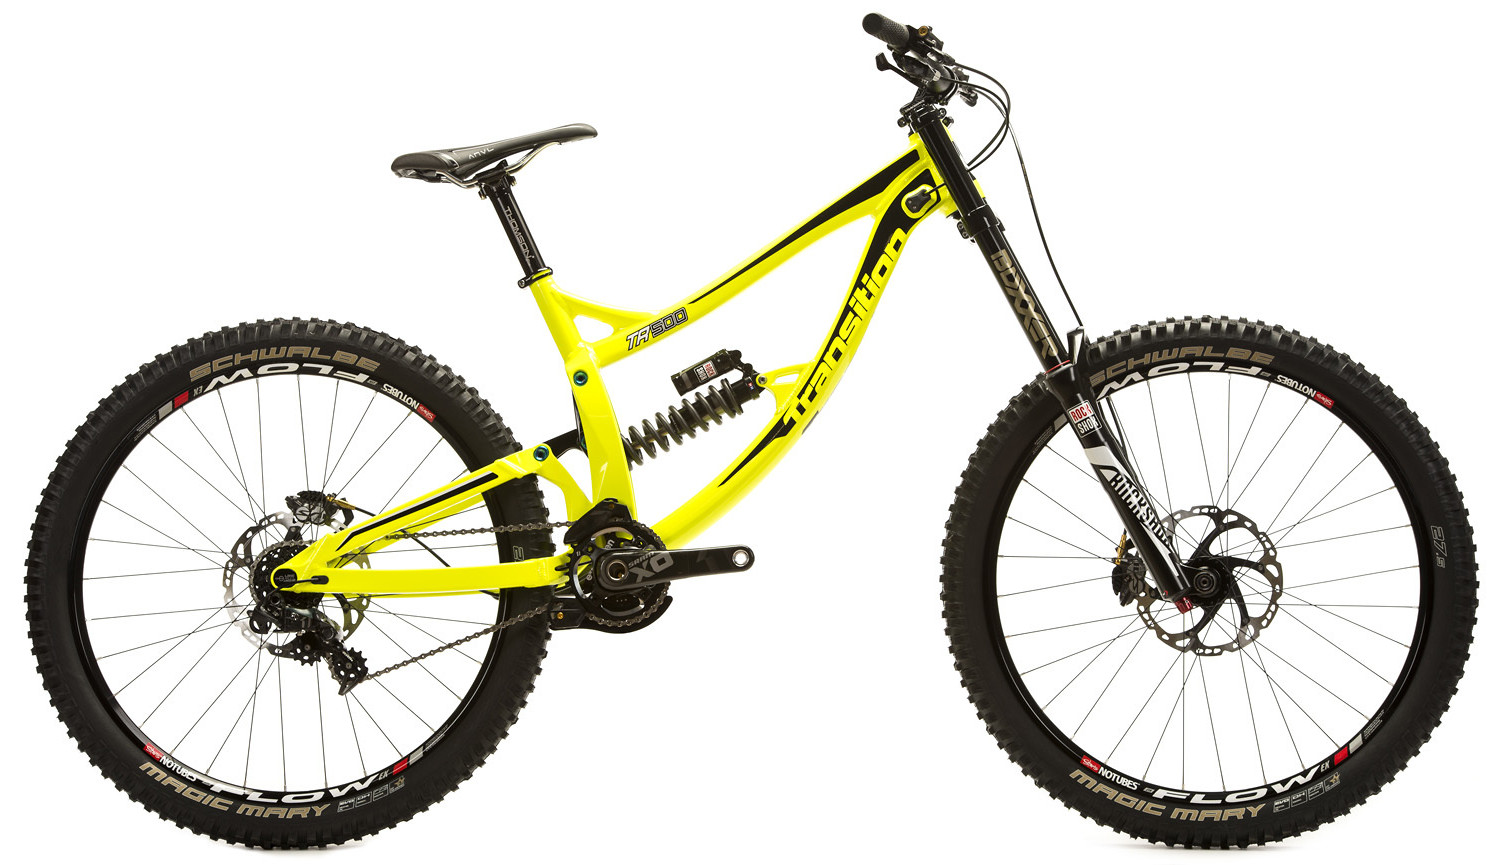 "2015 Transition TR500 1 27.5 Bike 2015 Transition TR500 1 27.5"" bike"